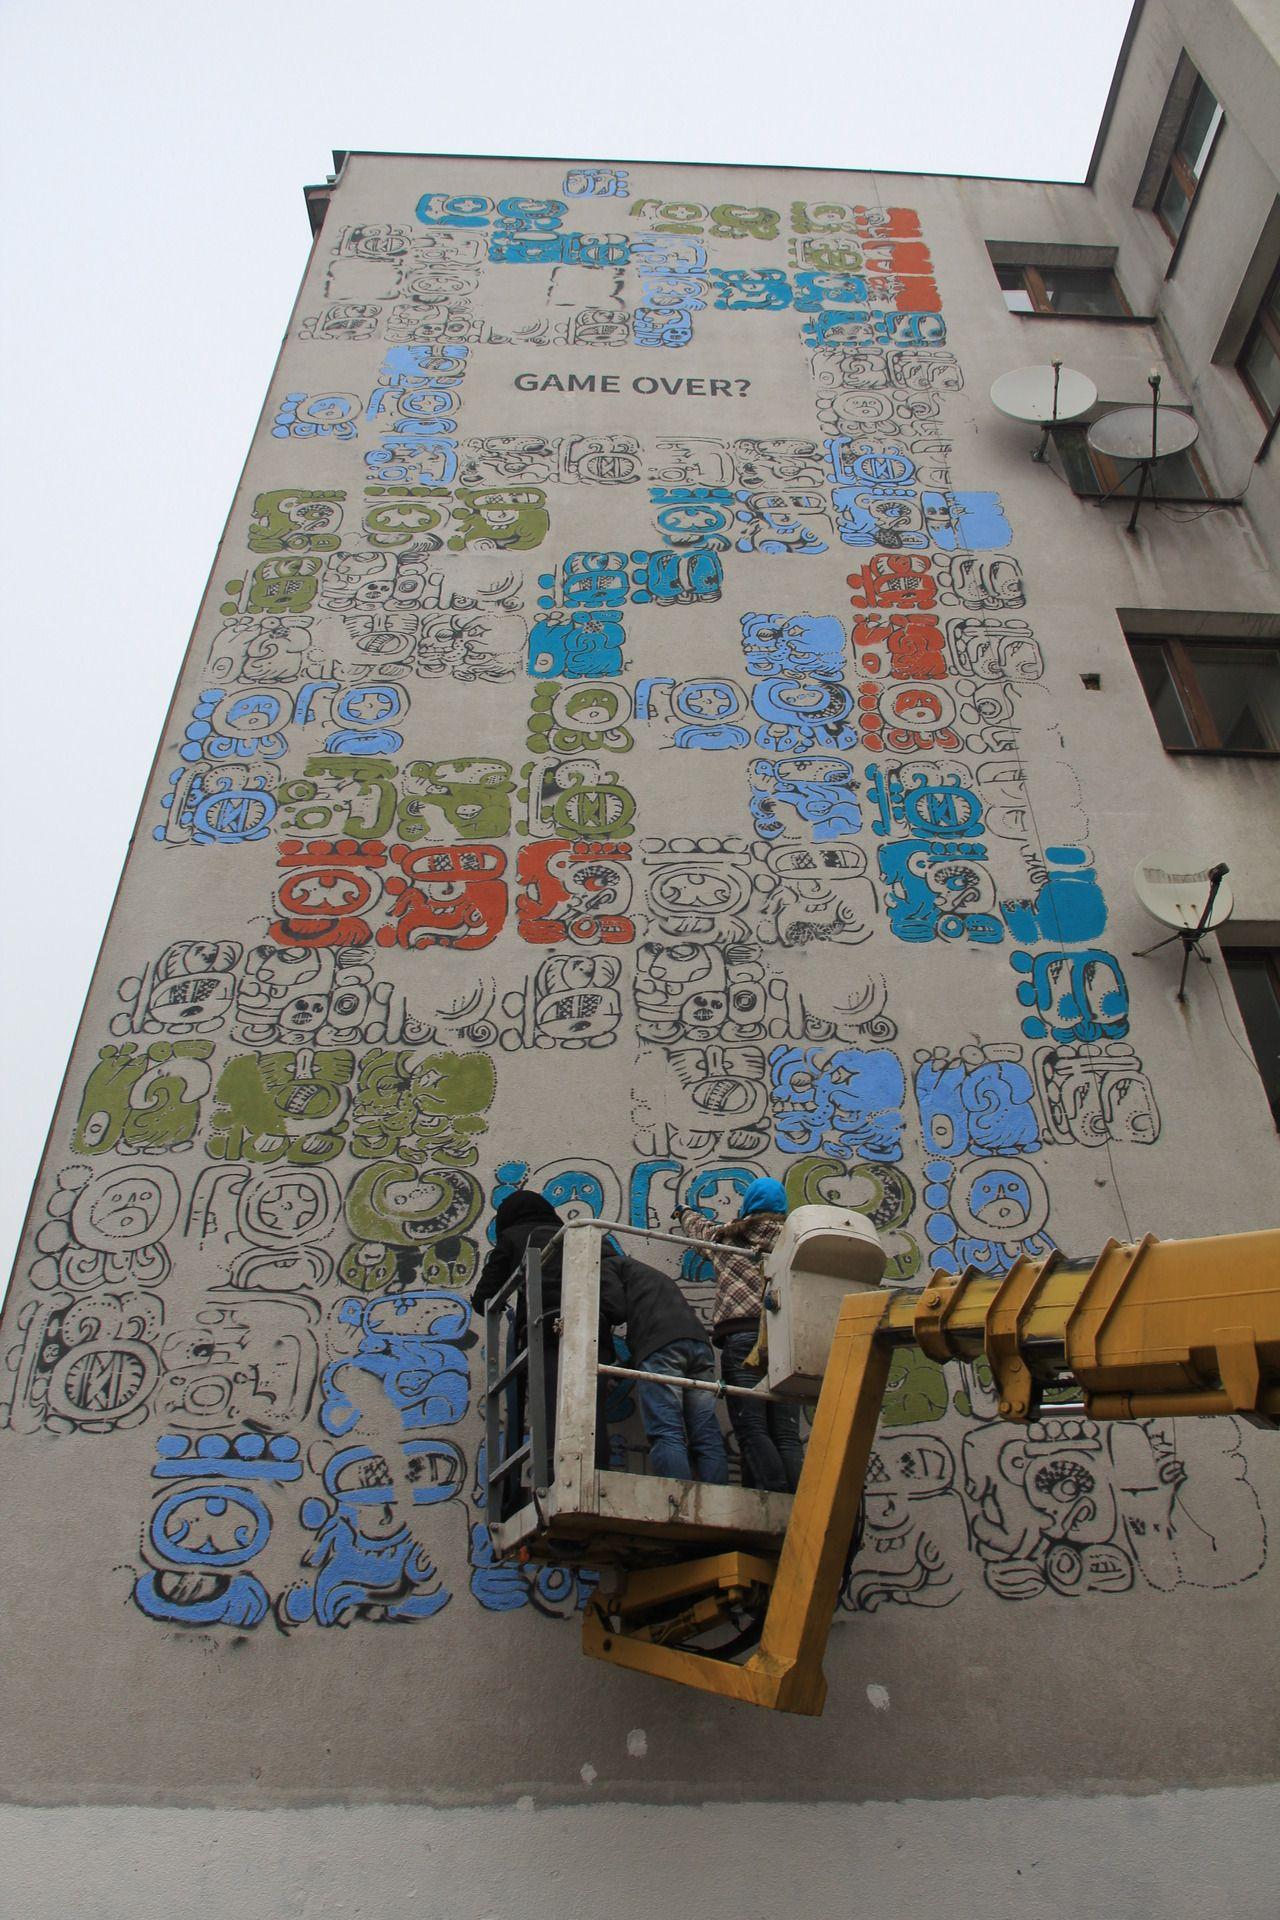 Mayamural /// Day 4- 9 dec 2012, Cracow, Poland - Part 1 #streetart #crakow #graffiti #poland